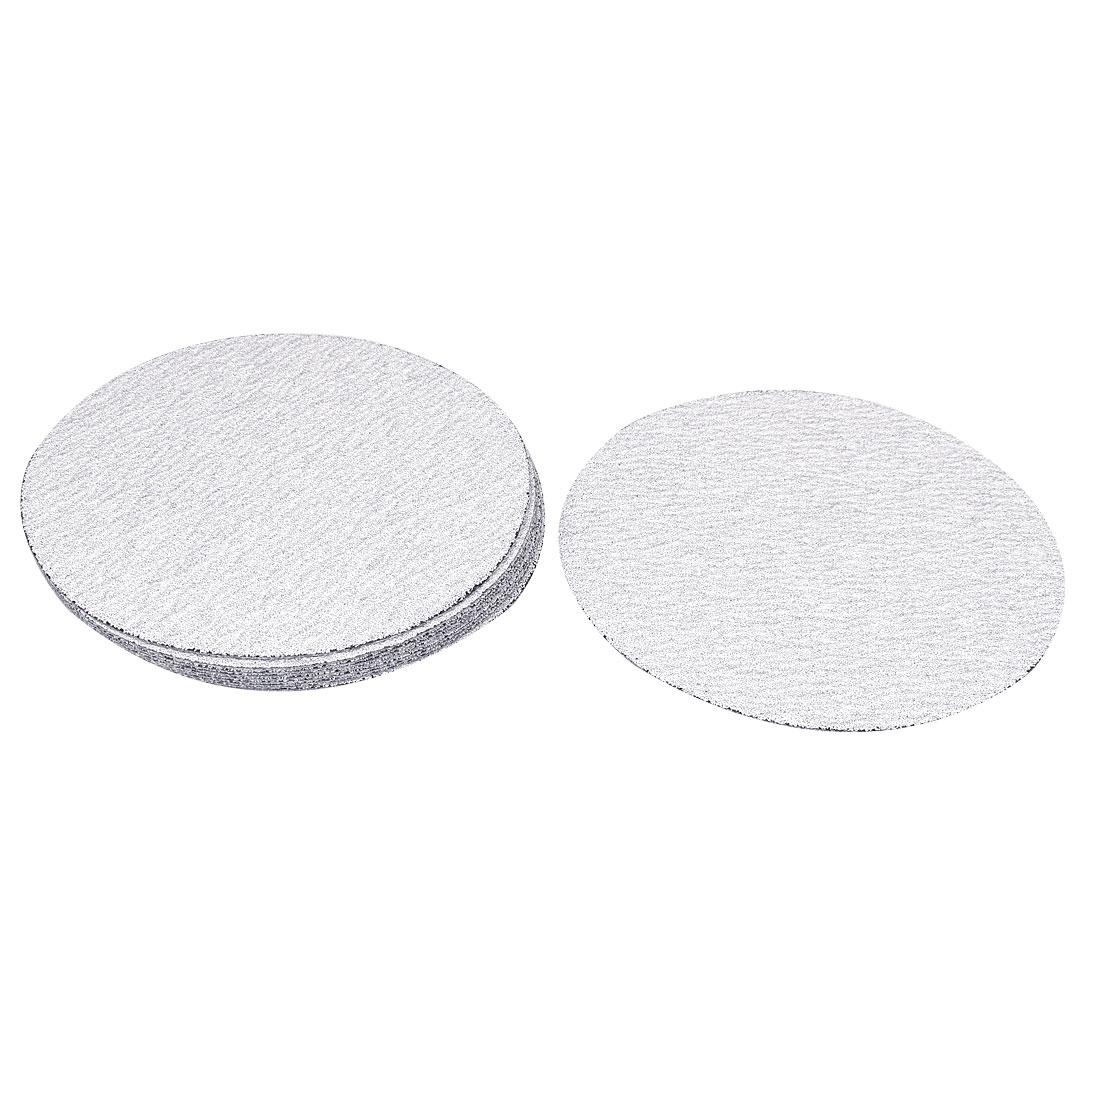 "6"" Dia Polishing Round Dry Abrasive Sanding Sandpaper Sheet Disc 80 Grit 10 Pcs"